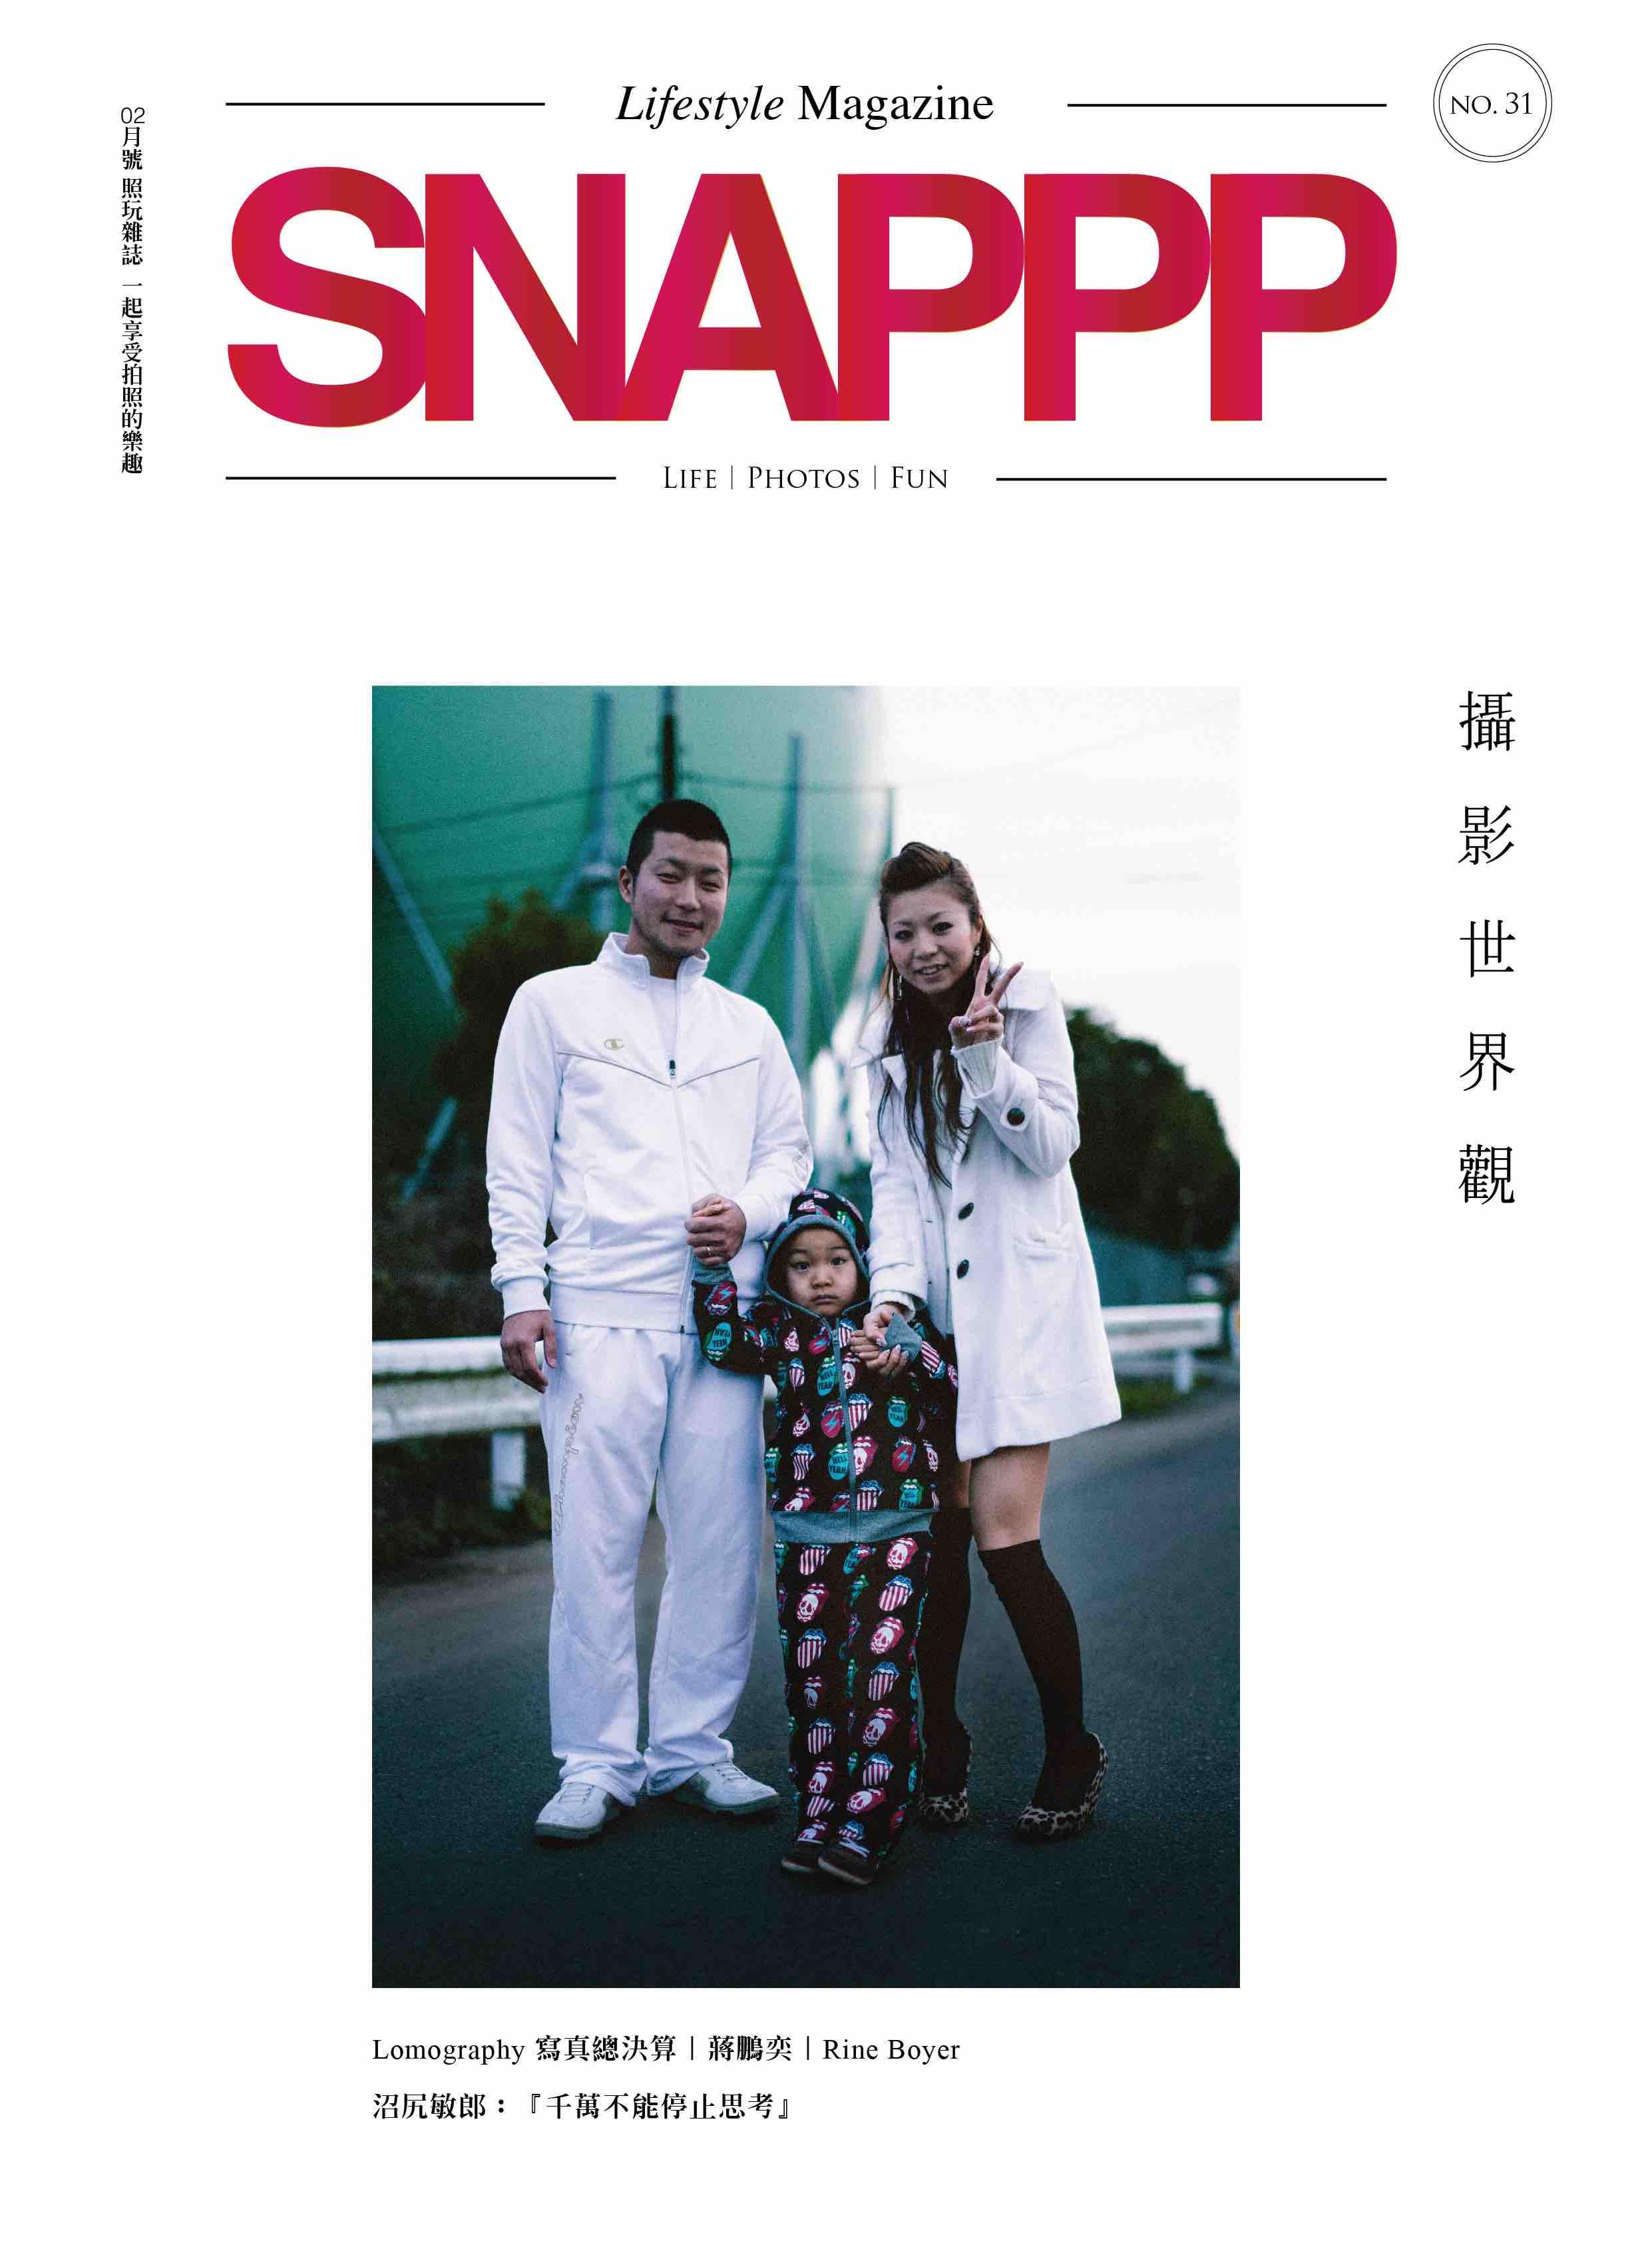 SNAPPP-NO31 COVER-ver2.jpg